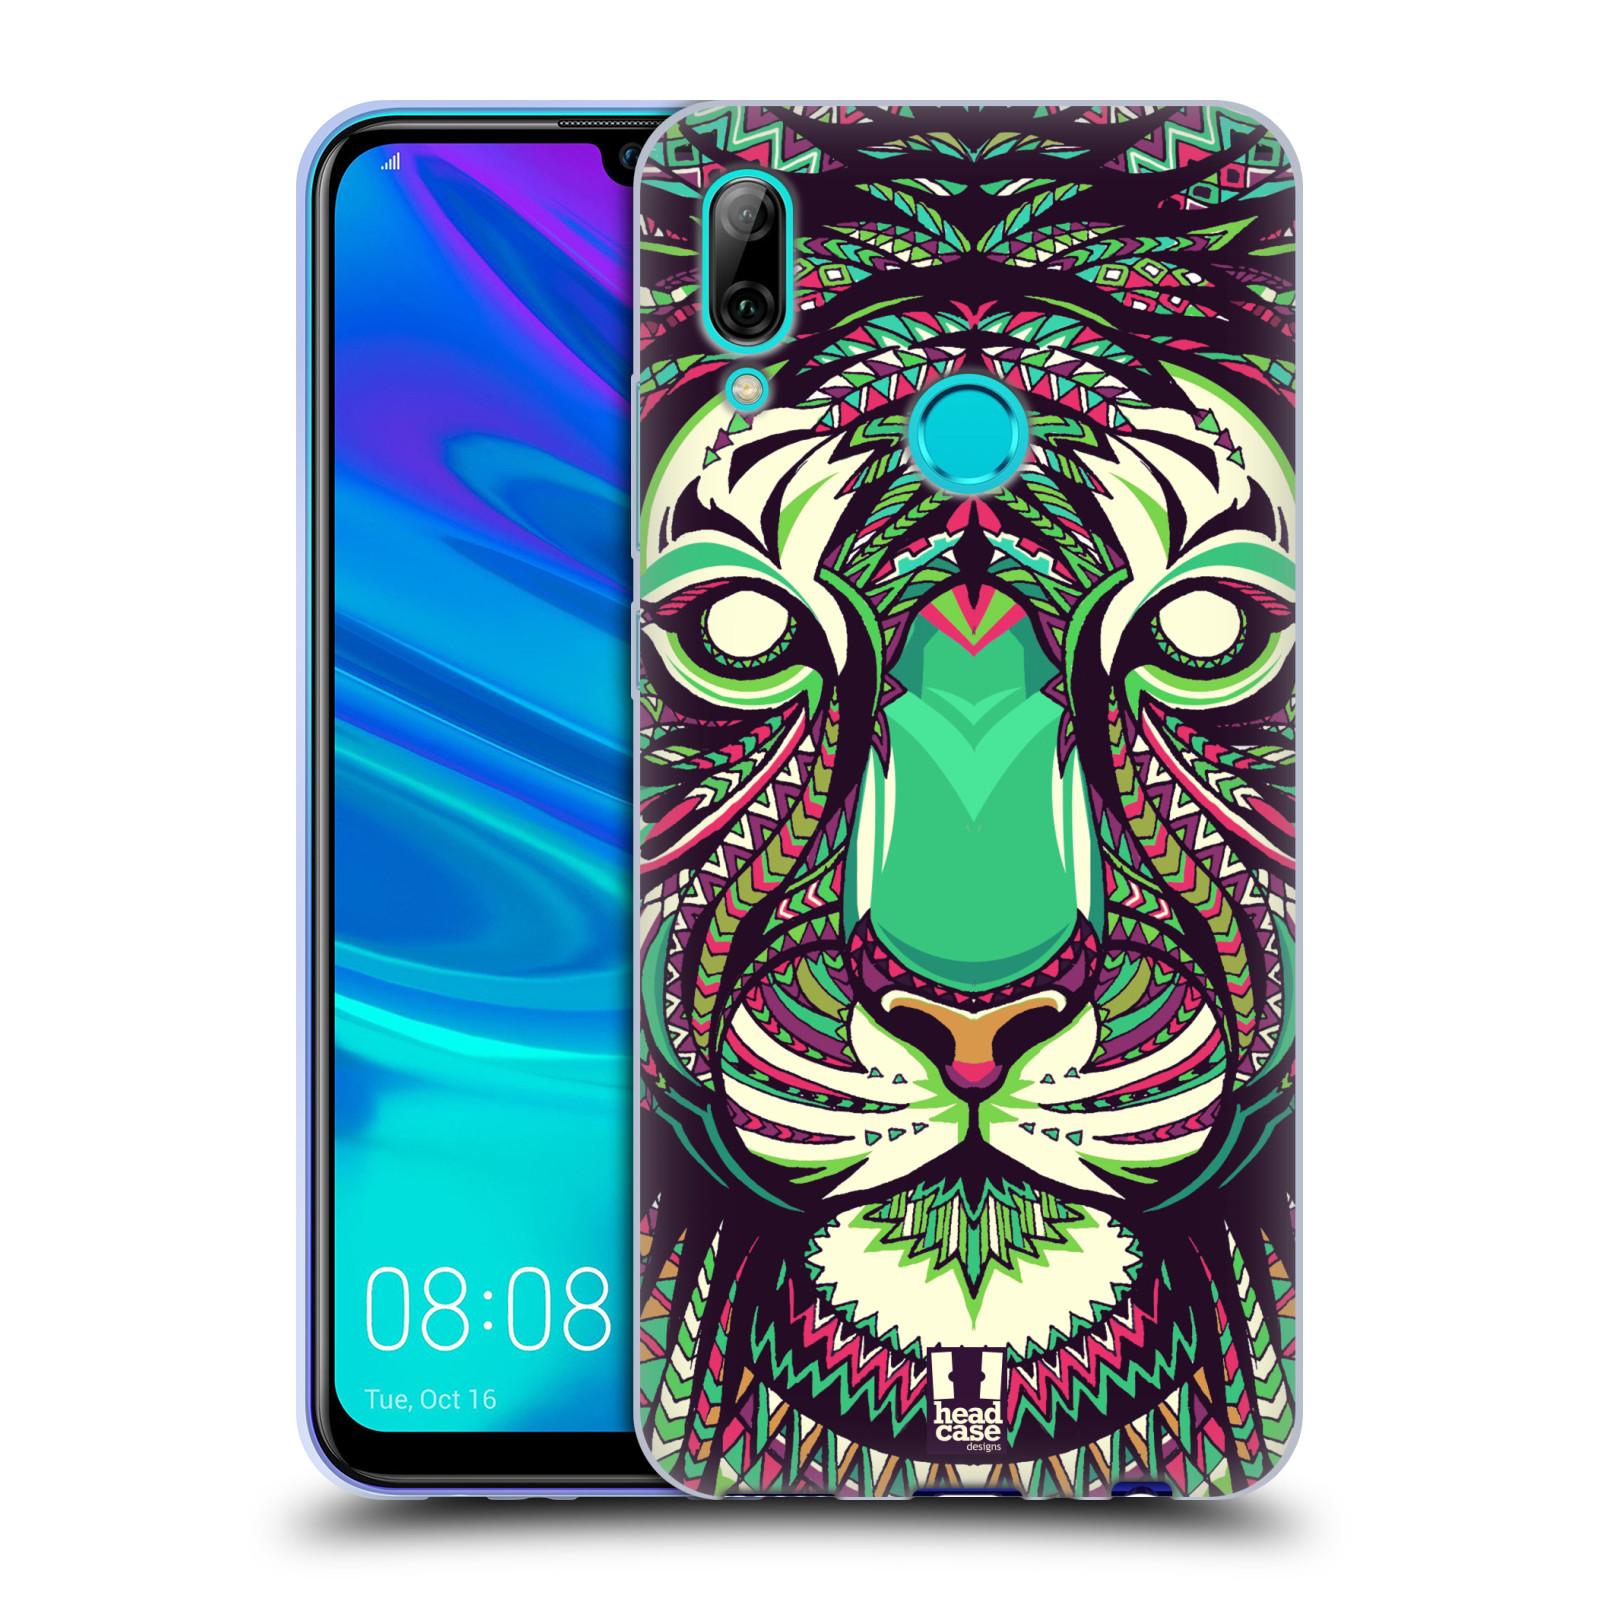 Silikonové pouzdro na mobil Huawei P Smart (2019) - Head Case - AZTEC TYGR